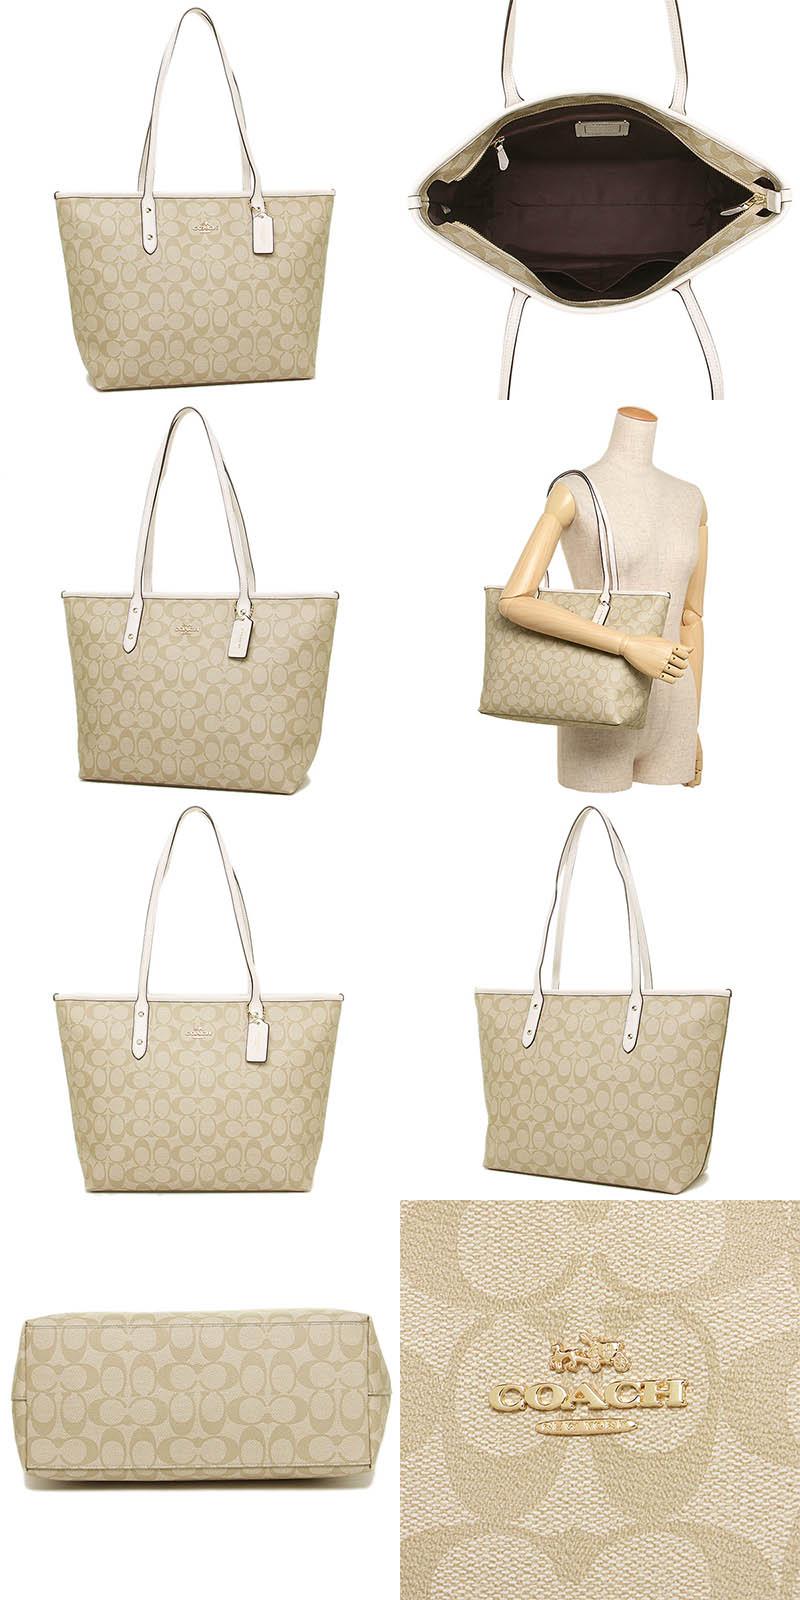 8168894df Coach big tote bag office lady shoulder bag handbag outlet COACH ...